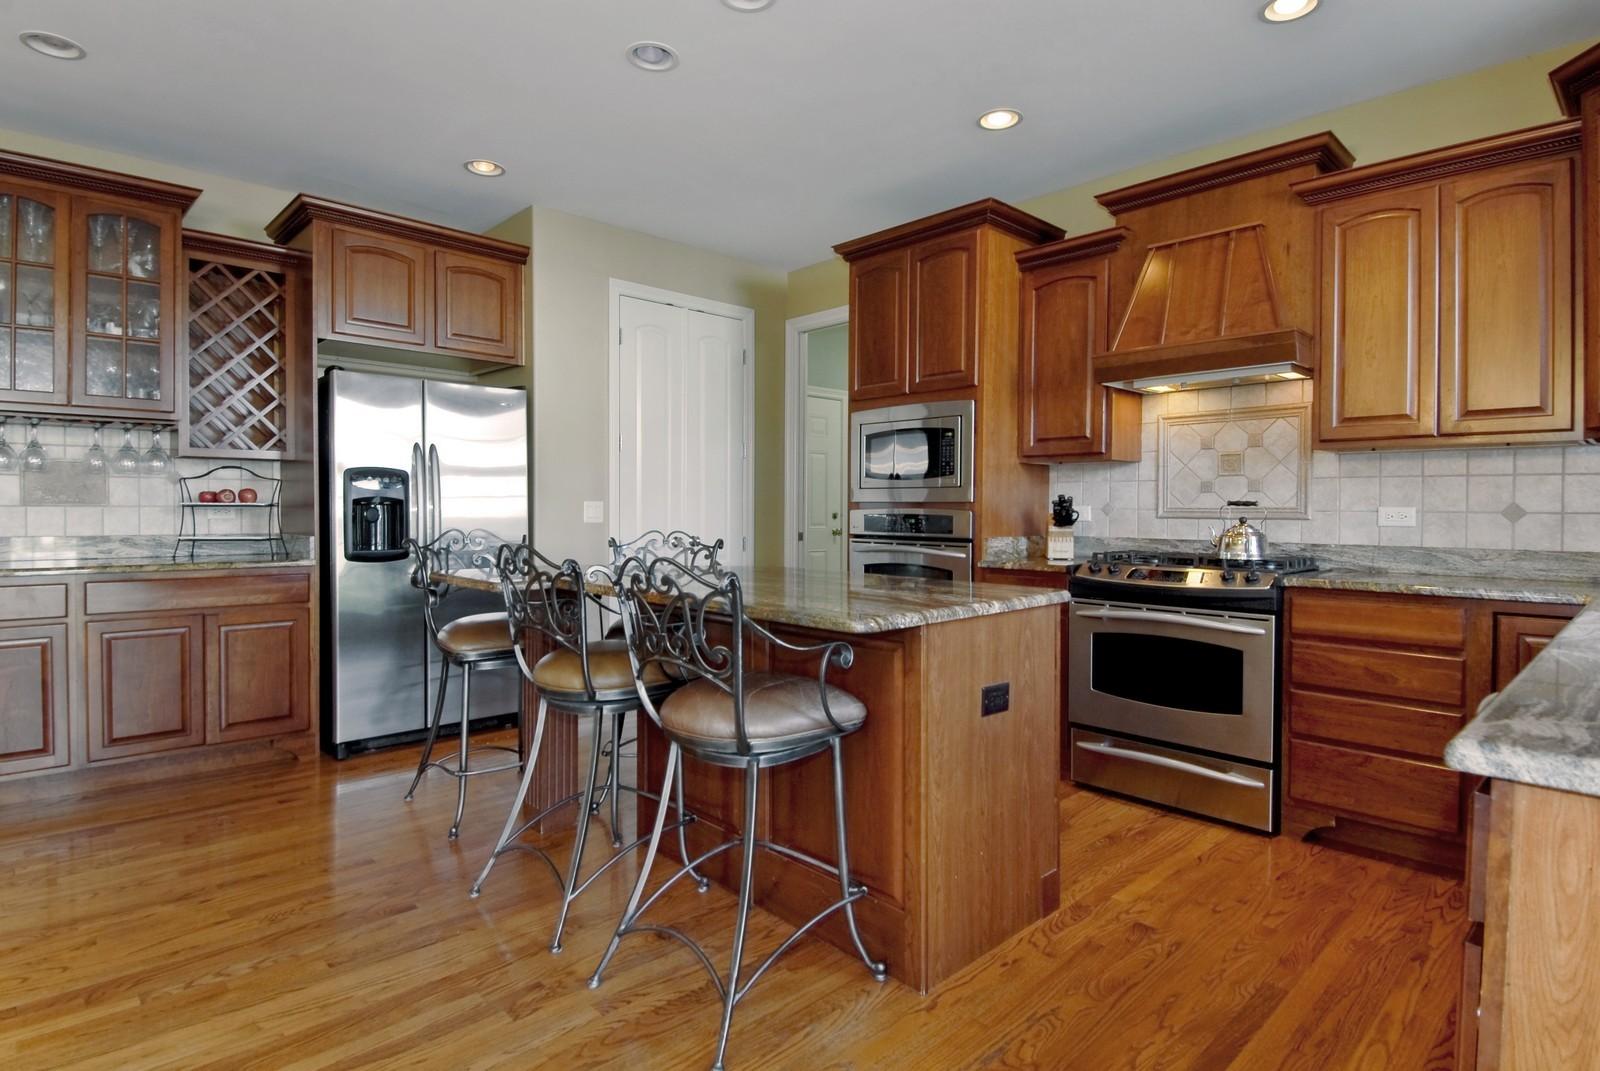 Real Estate Photography - 3839 Junebreeze Ln, Naperville, IL, 60564 - Kitchen